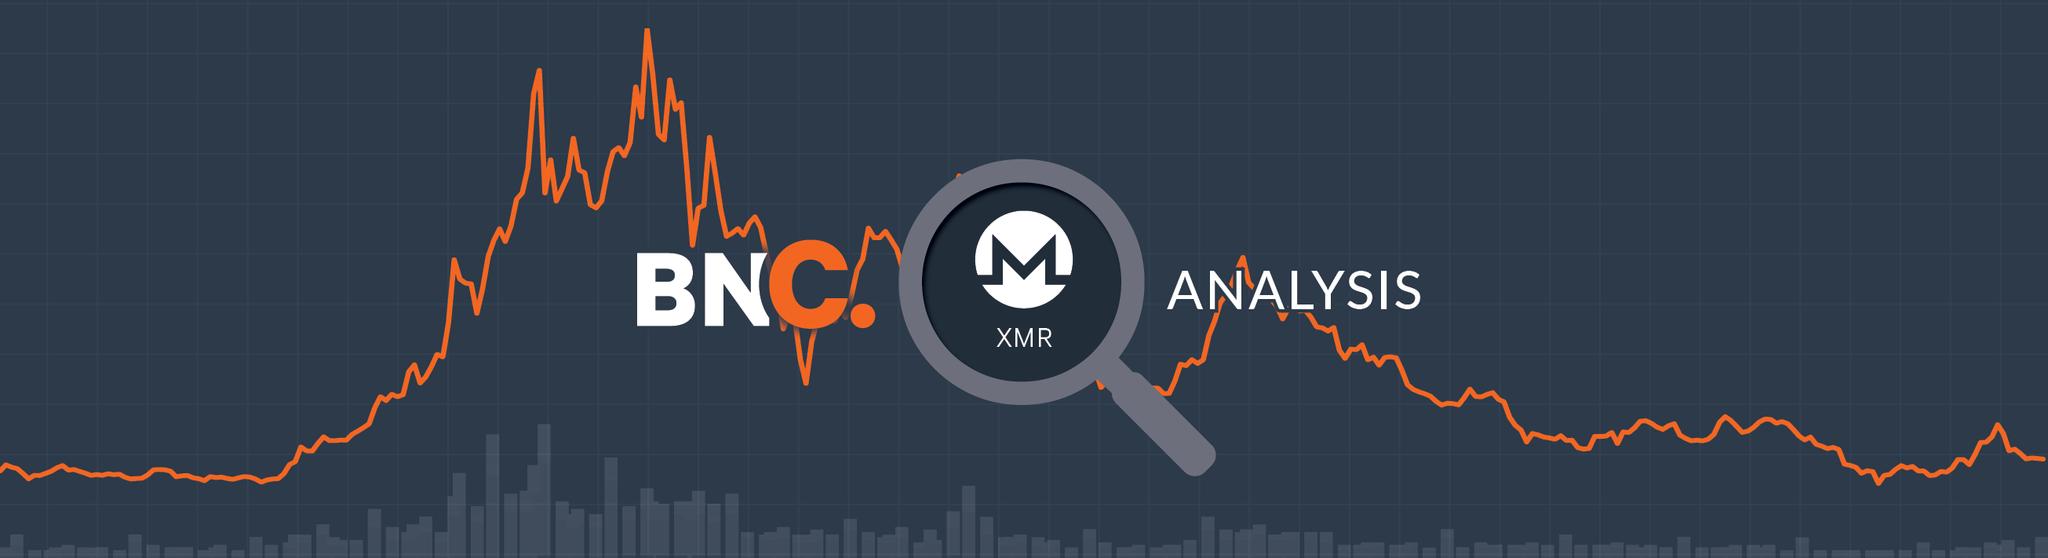 Monero Rate Analysis – Prospective bullish pattern shift